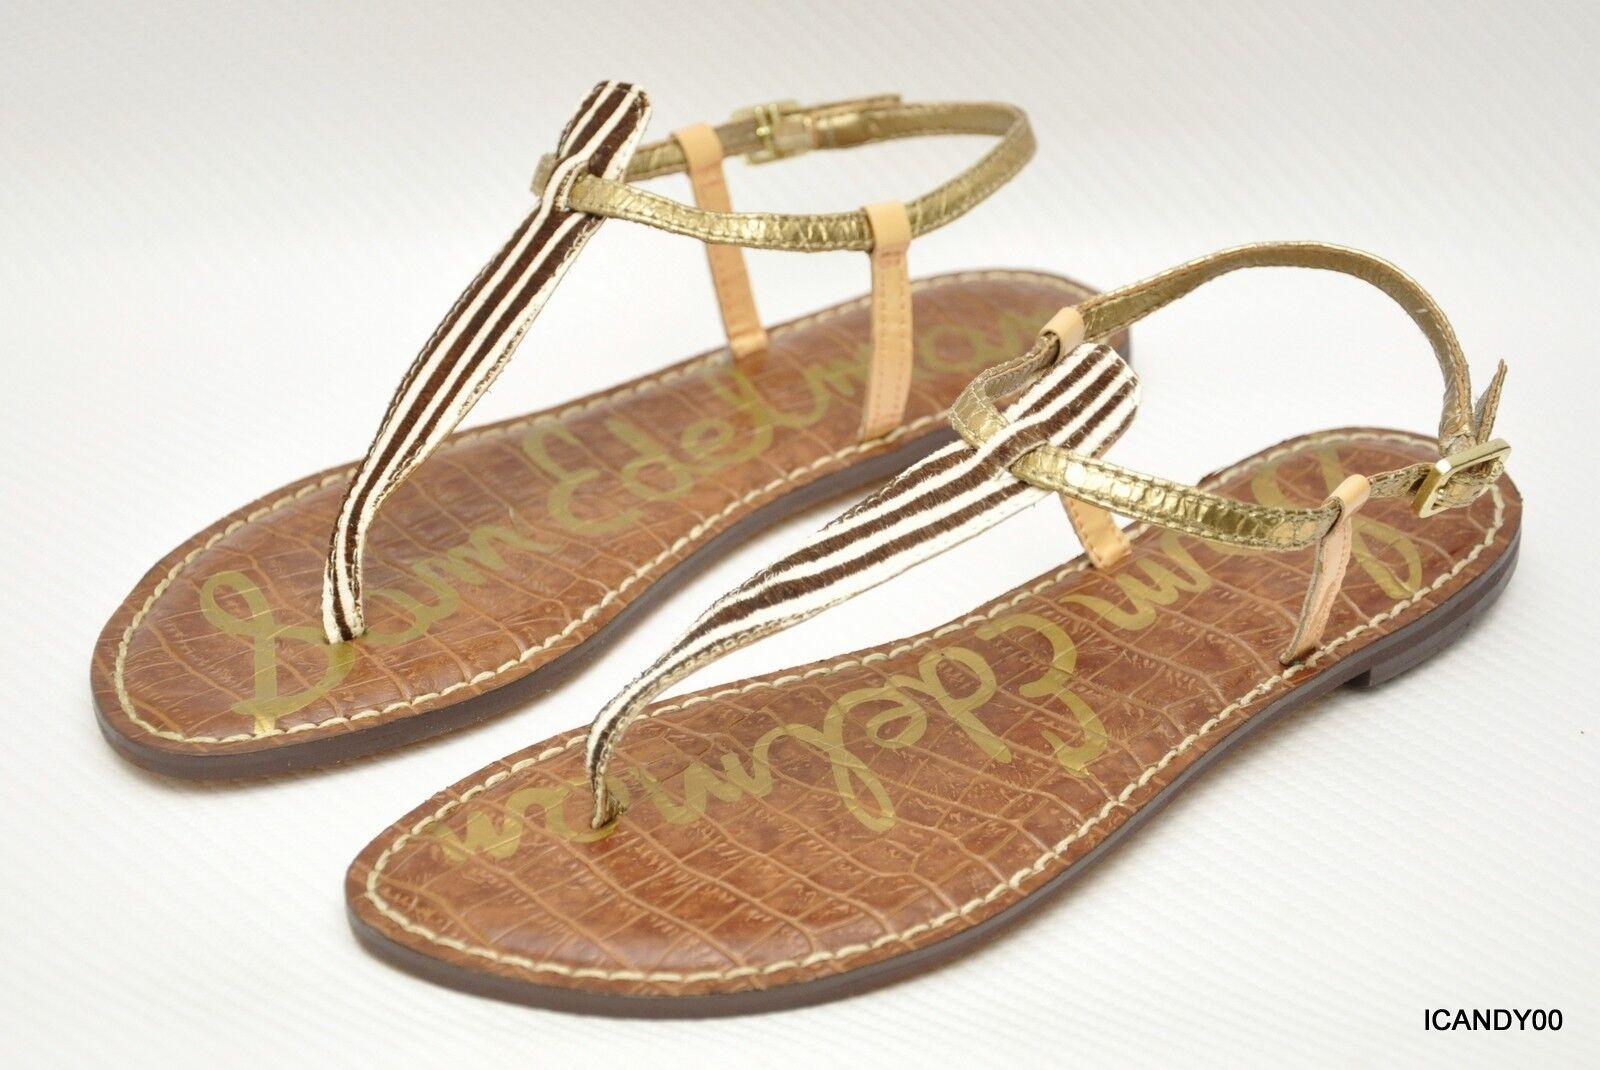 New Sam Edelman GIGI Real Fur Flat Thong Ankle Sandal Sandal Sandal shoes Zebra gold 6.5 37.5 a8311b